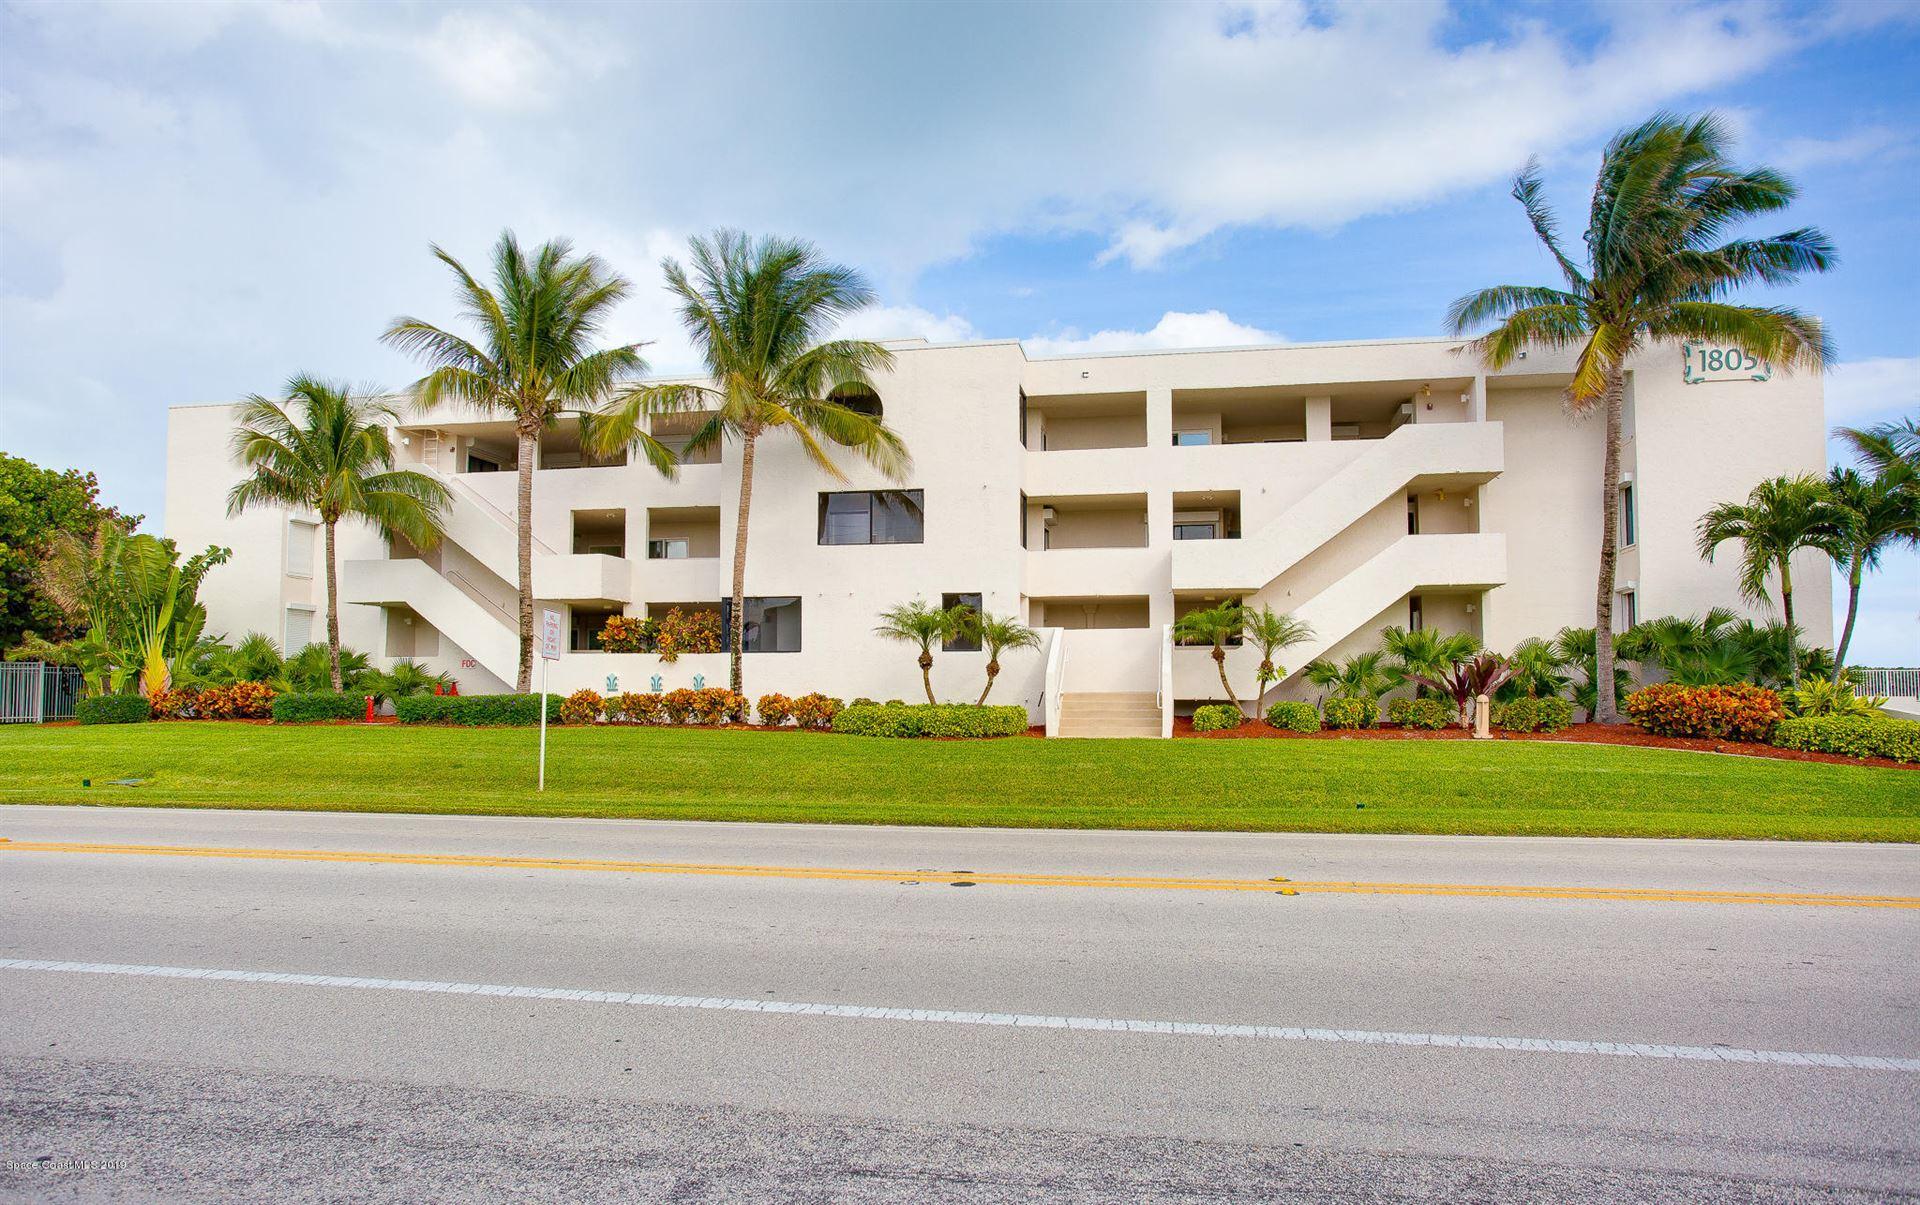 1805 Atlantic Street #122, Indialantic, FL 32951 - #: 862228